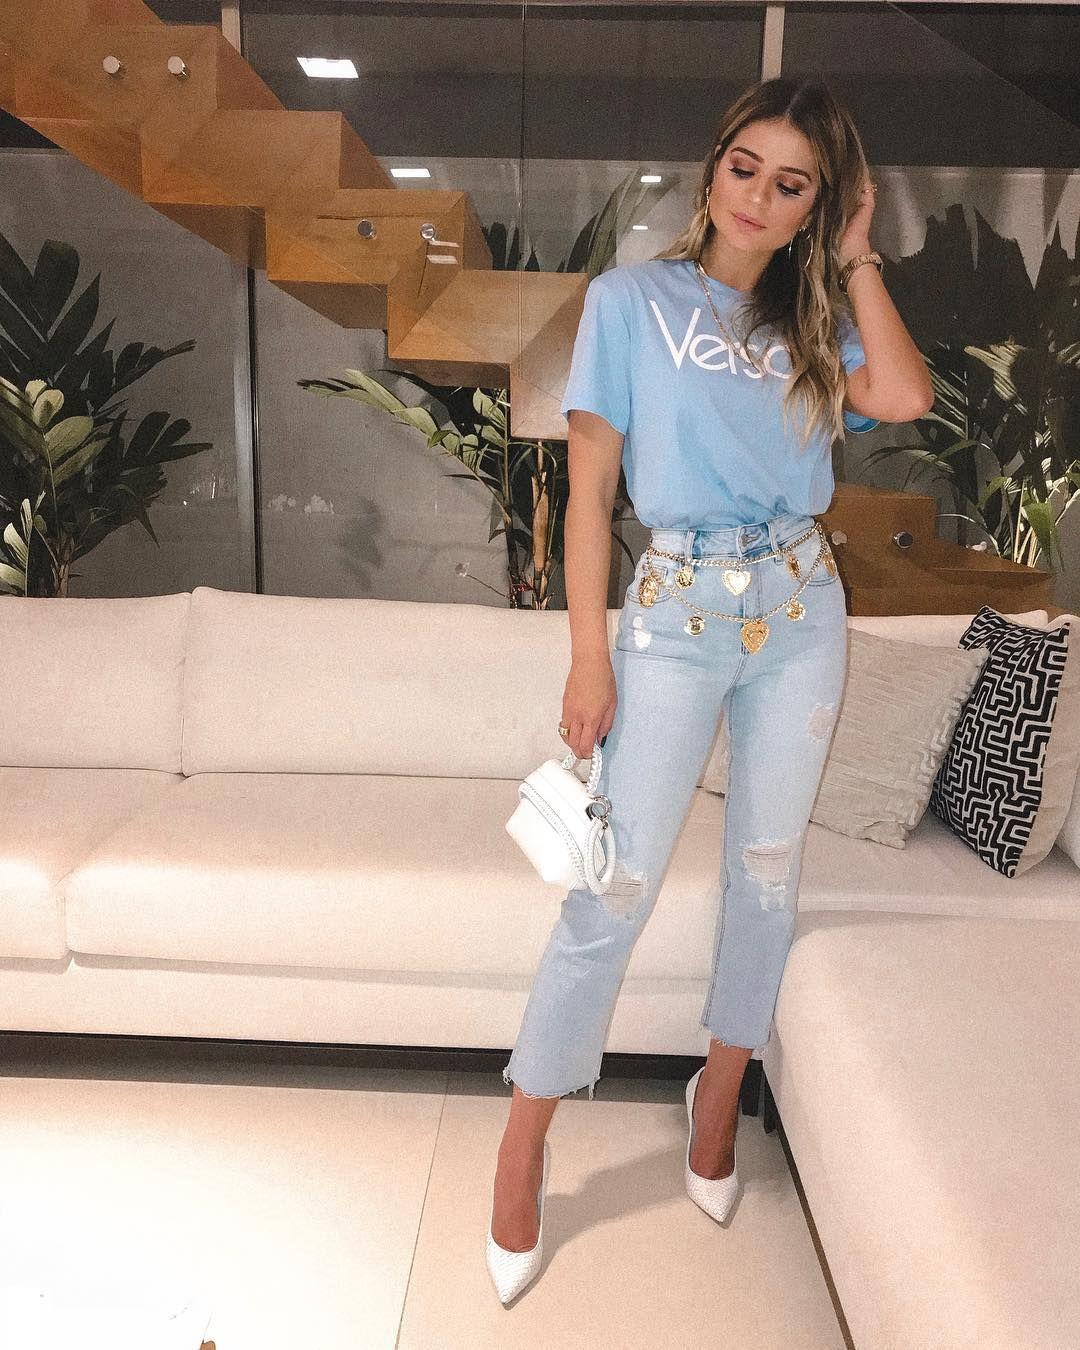 1c4cb7c37 Look Thássia Naves, Versace, t-shirt azul, calça jeans rasgada, scarpin  branco, bolsa branca, cinto dourado, look blogueiras, famosas